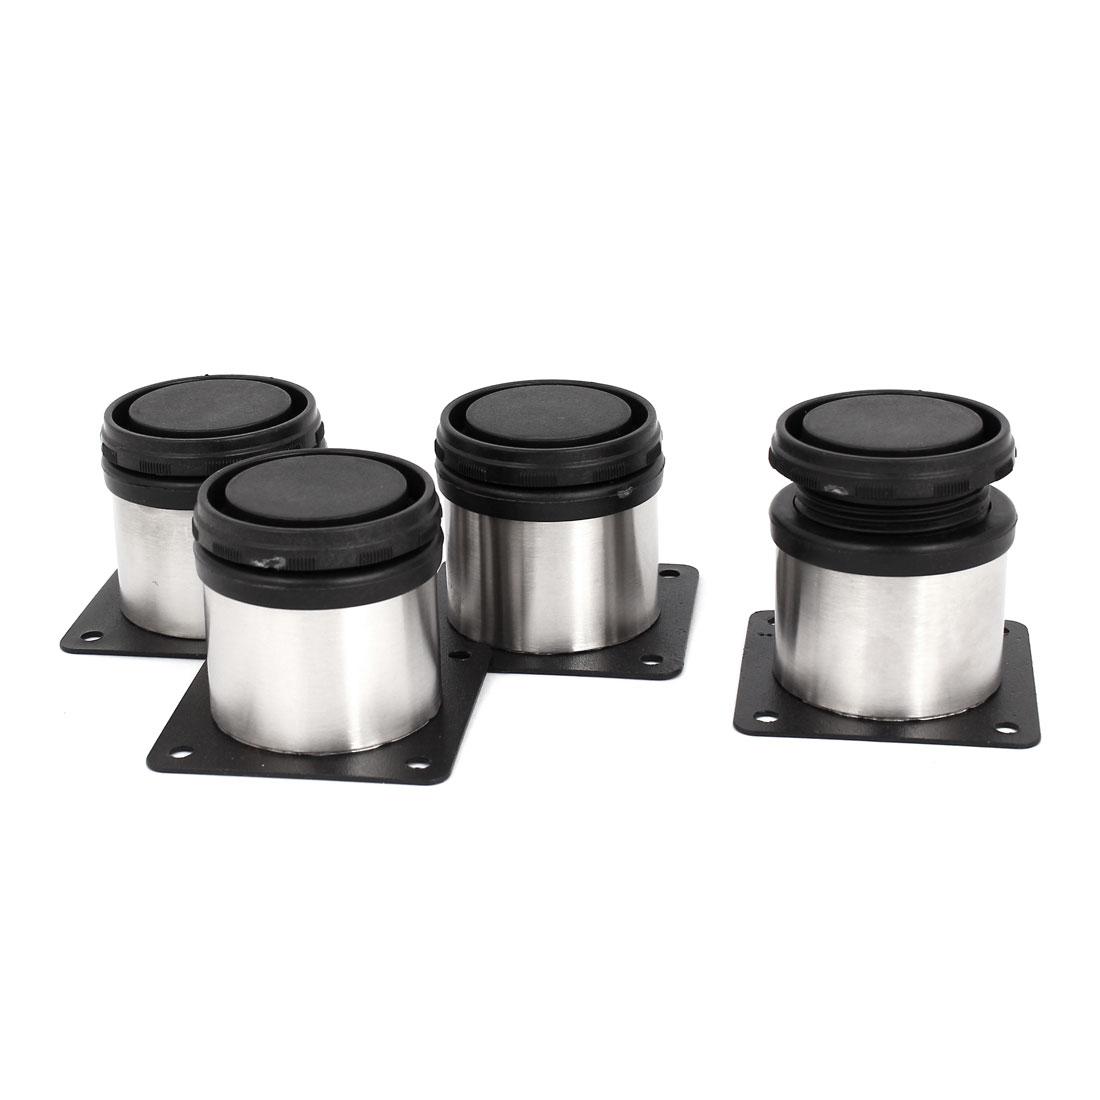 4pcs 50mm x 50mm Adjustable Plinth Leg Feet for Kitchen Cabinet Furniture Sofa